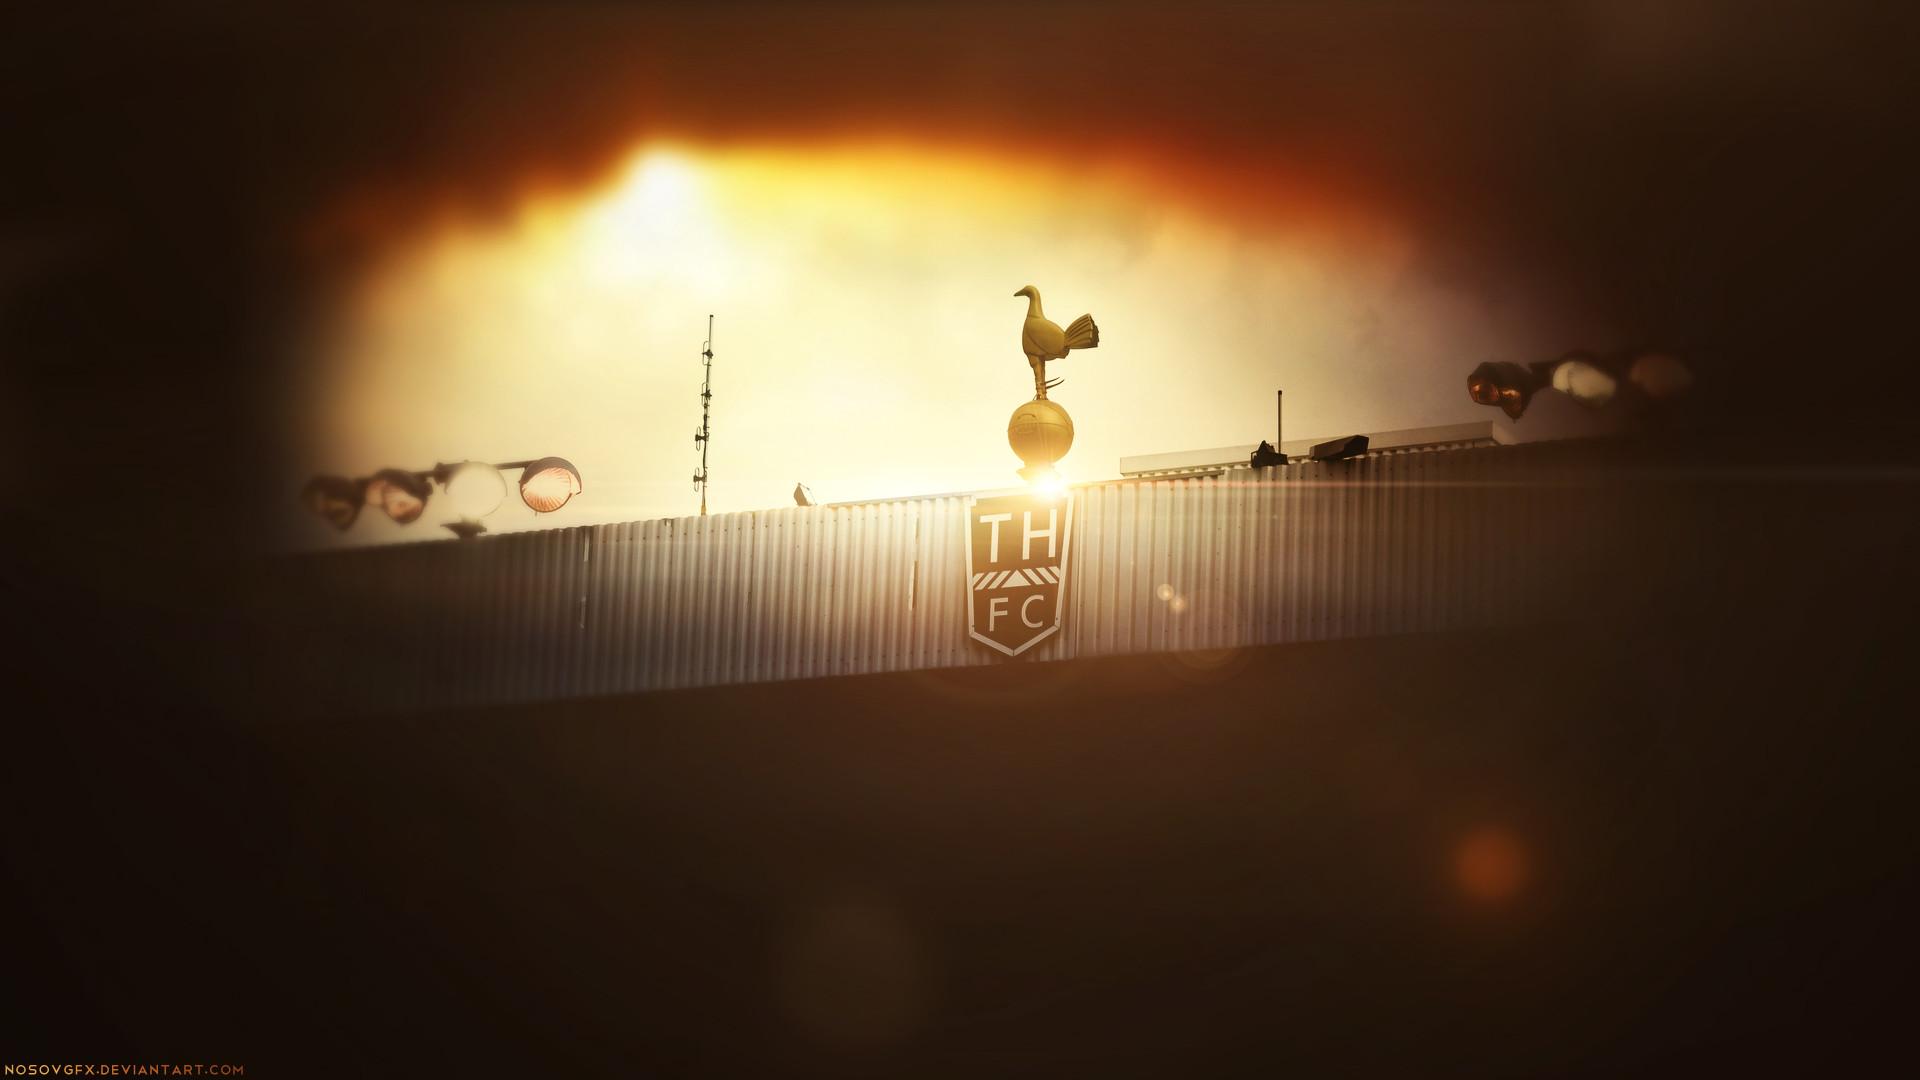 Tottenham Hotspur by nosovgfx Tottenham Hotspur by nosovgfx